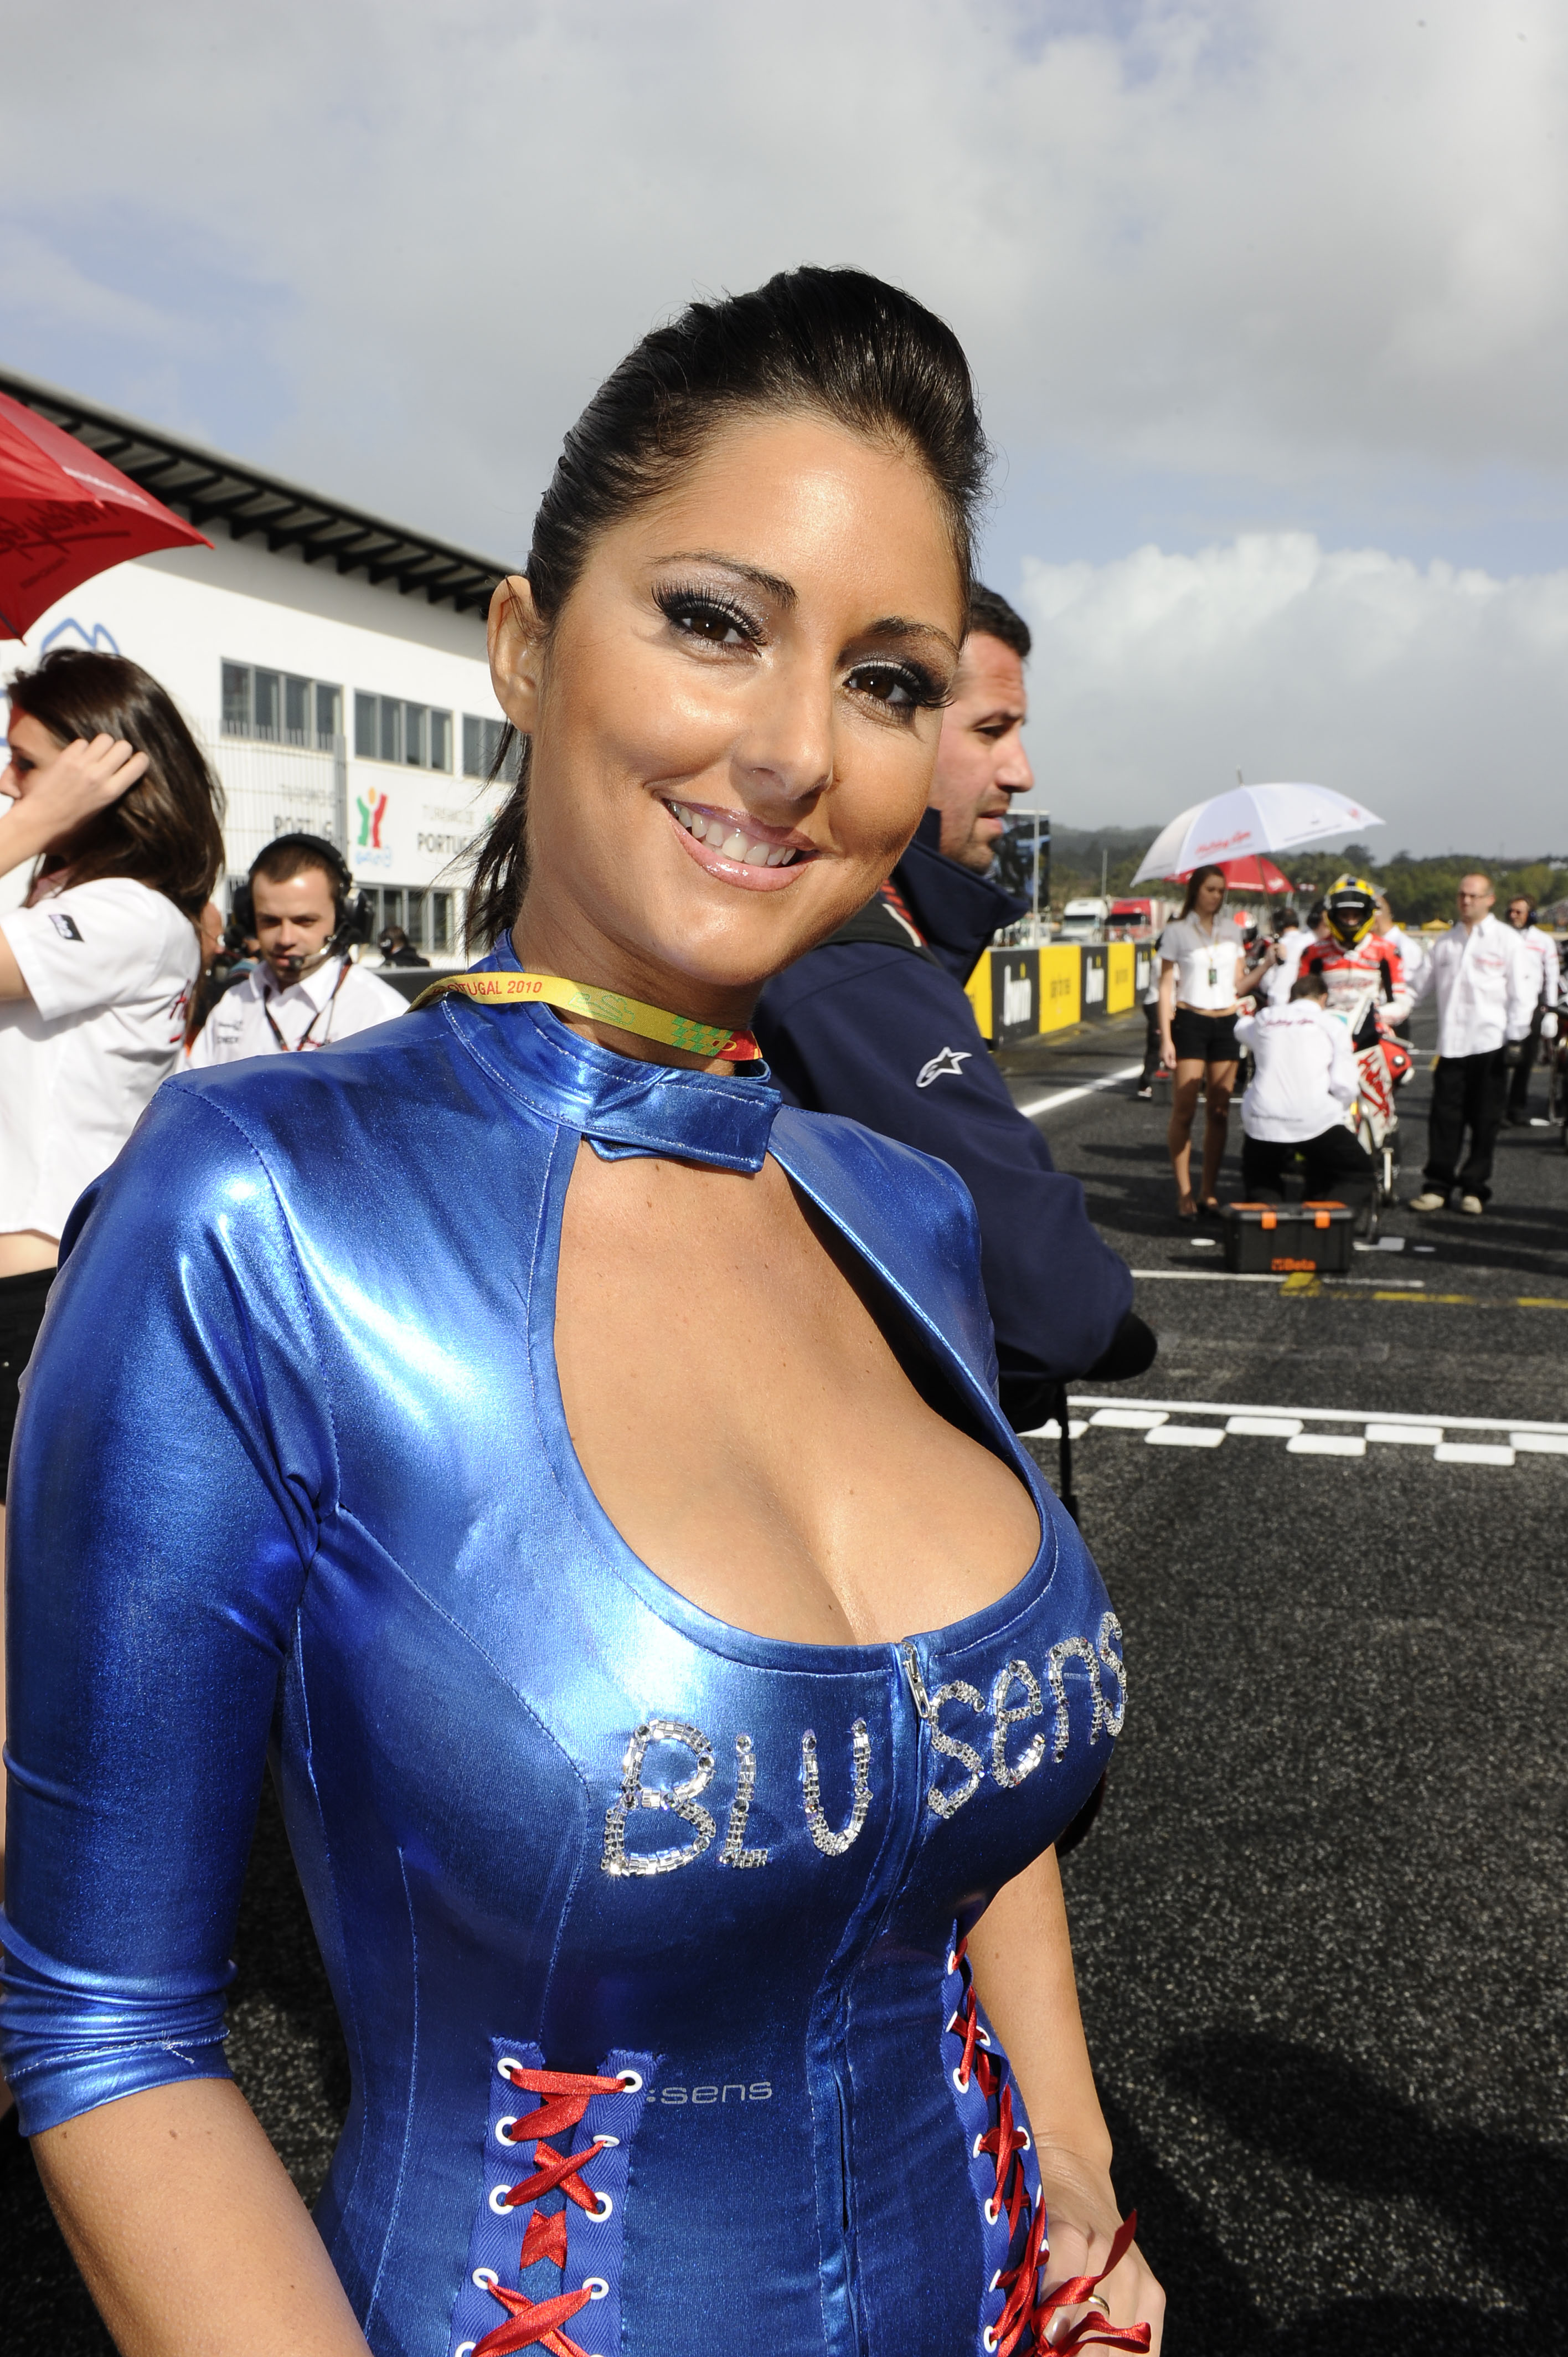 Estoril MotoGP grid girl gallery | Visordown